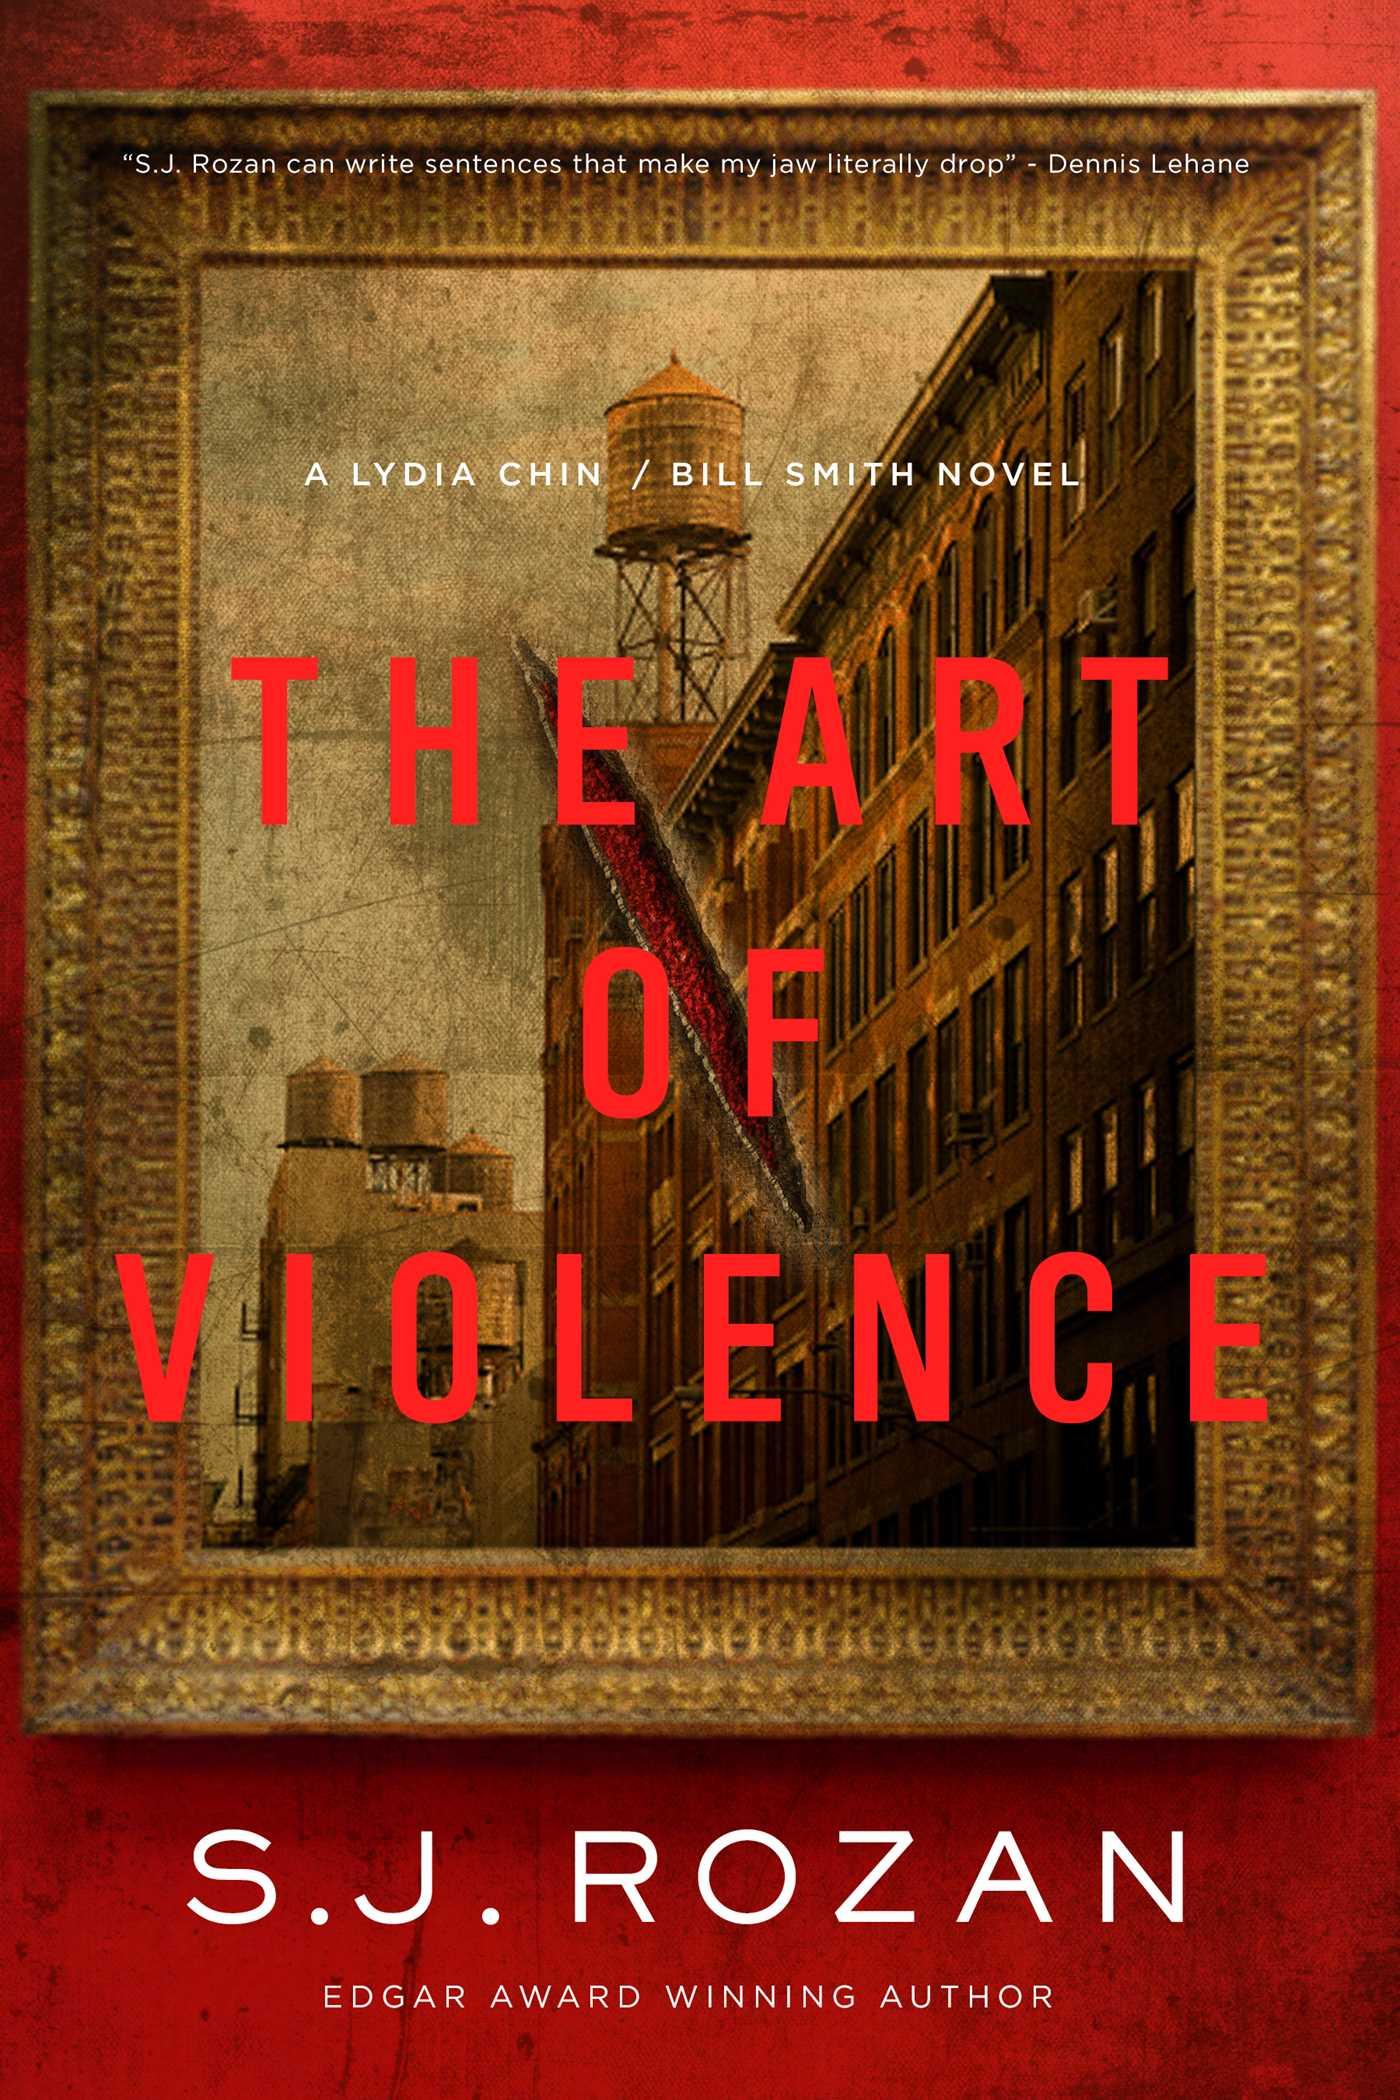 The Art of Violence A Lydia Chin/Bill Smith Novel